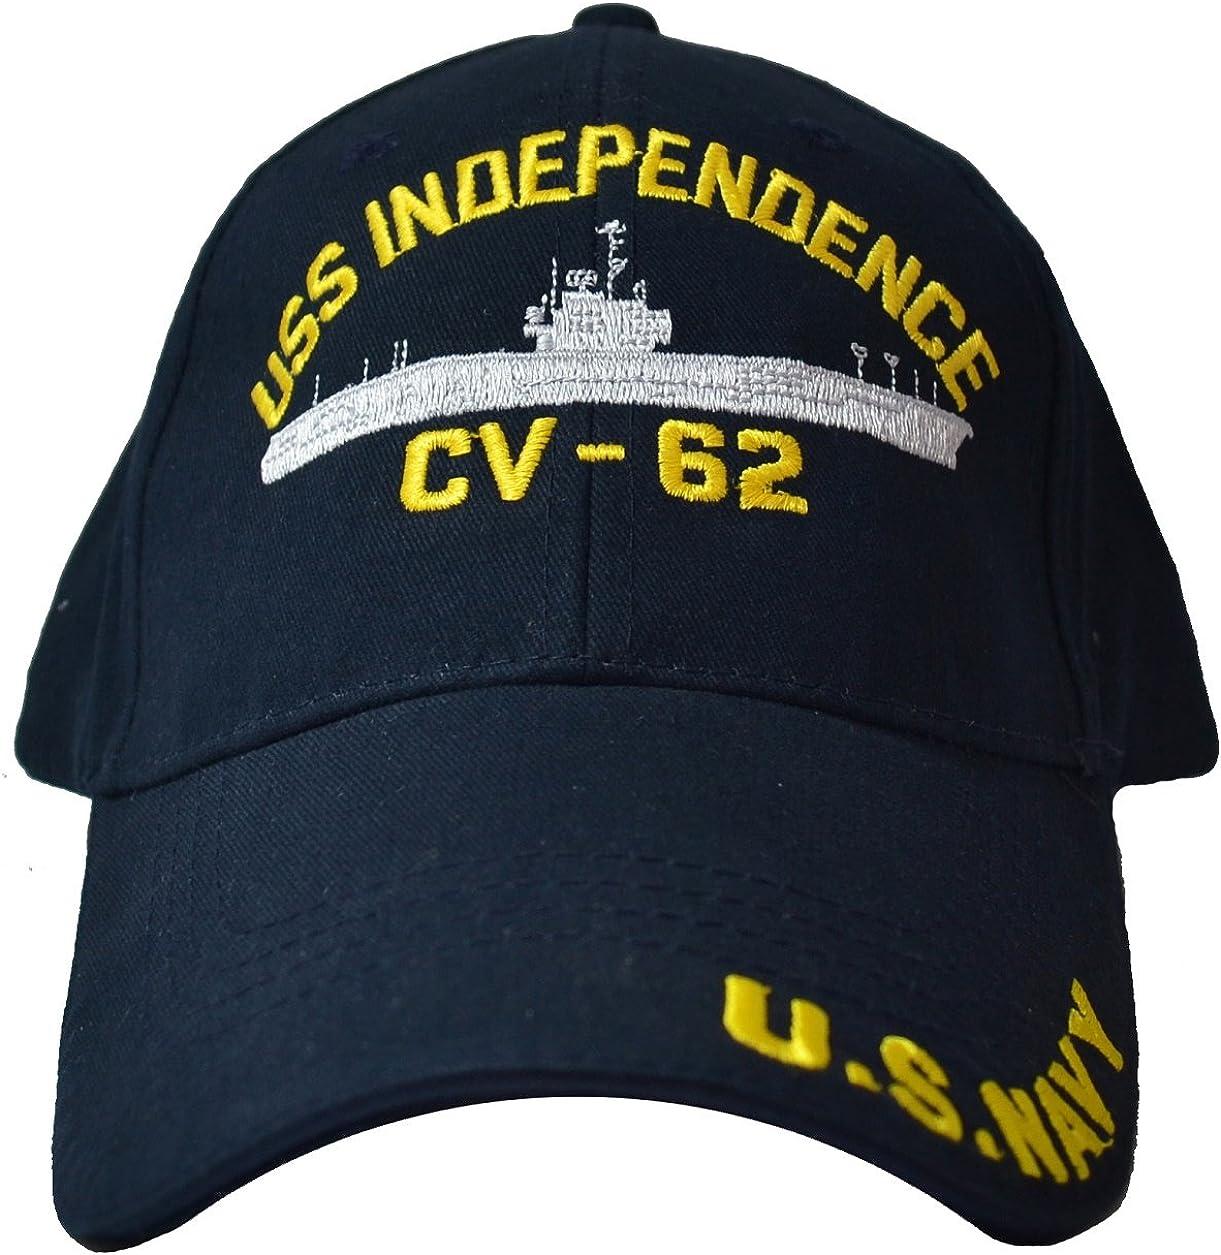 EAGLE CREST USS Independence CV-62 Low Profile Cap Navy Blue